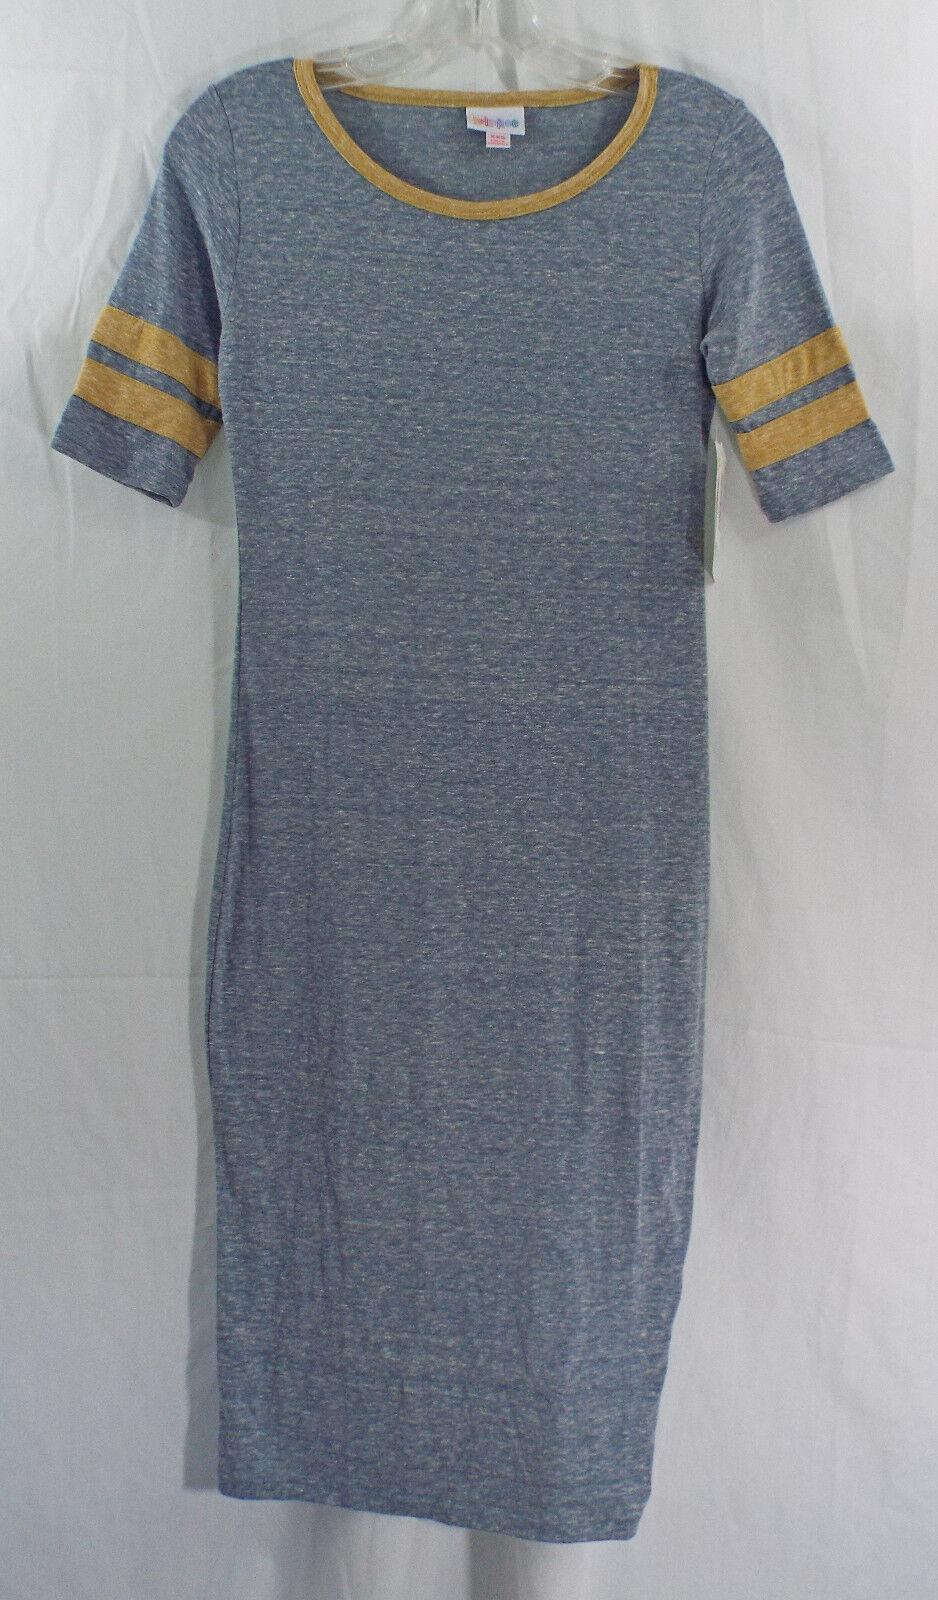 Womens LuLaRoe Dress Julia XXS in Heathered bluee gold NWT